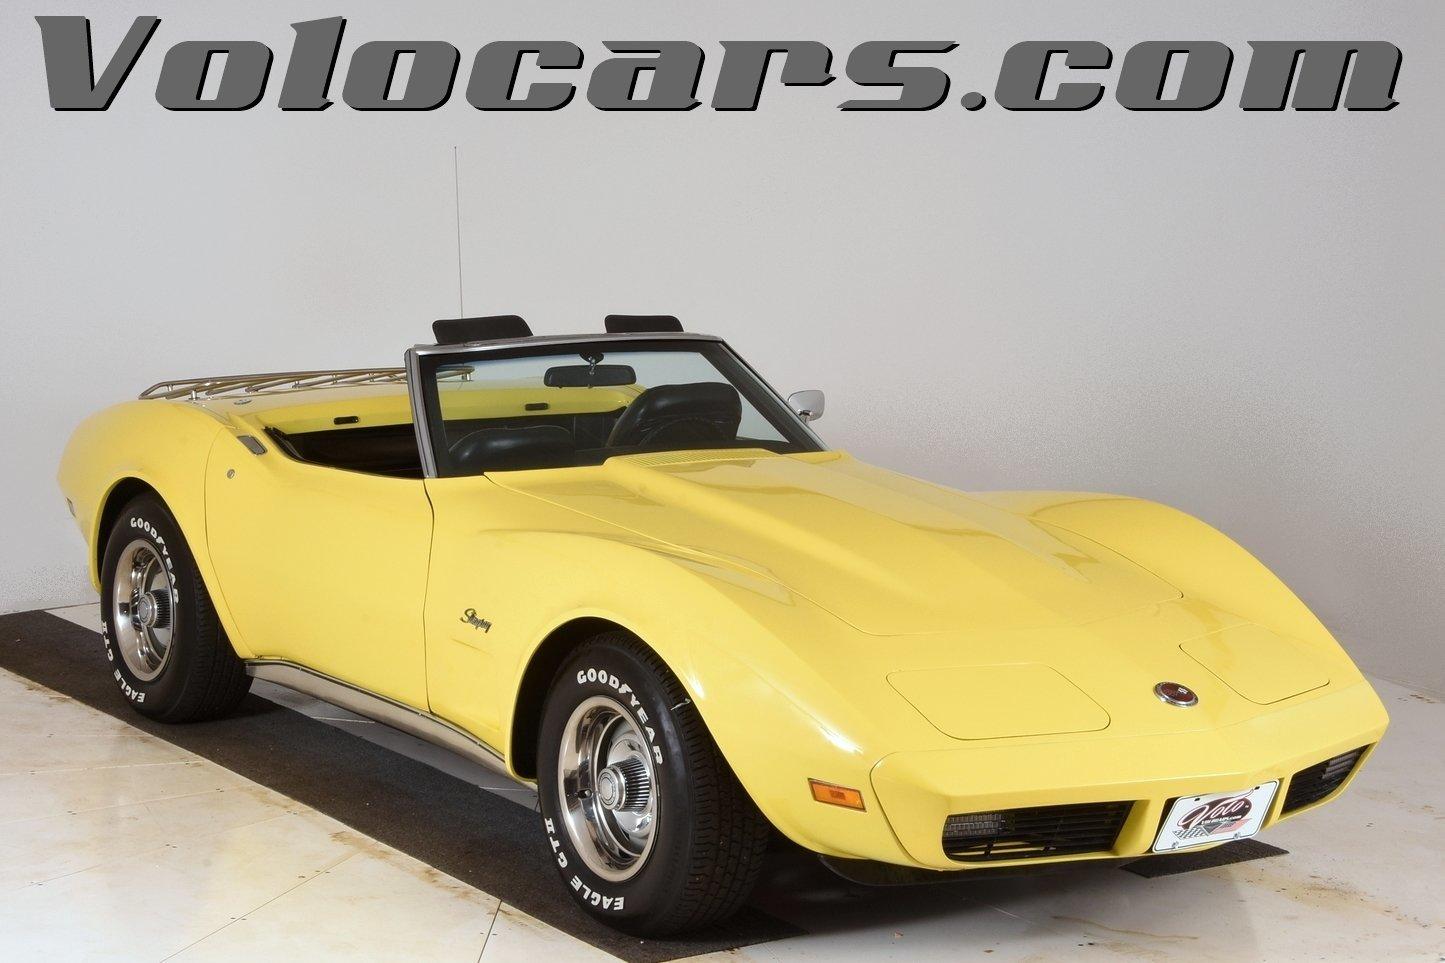 3545561bc4c3bd hd 1974 chevrolet corvette